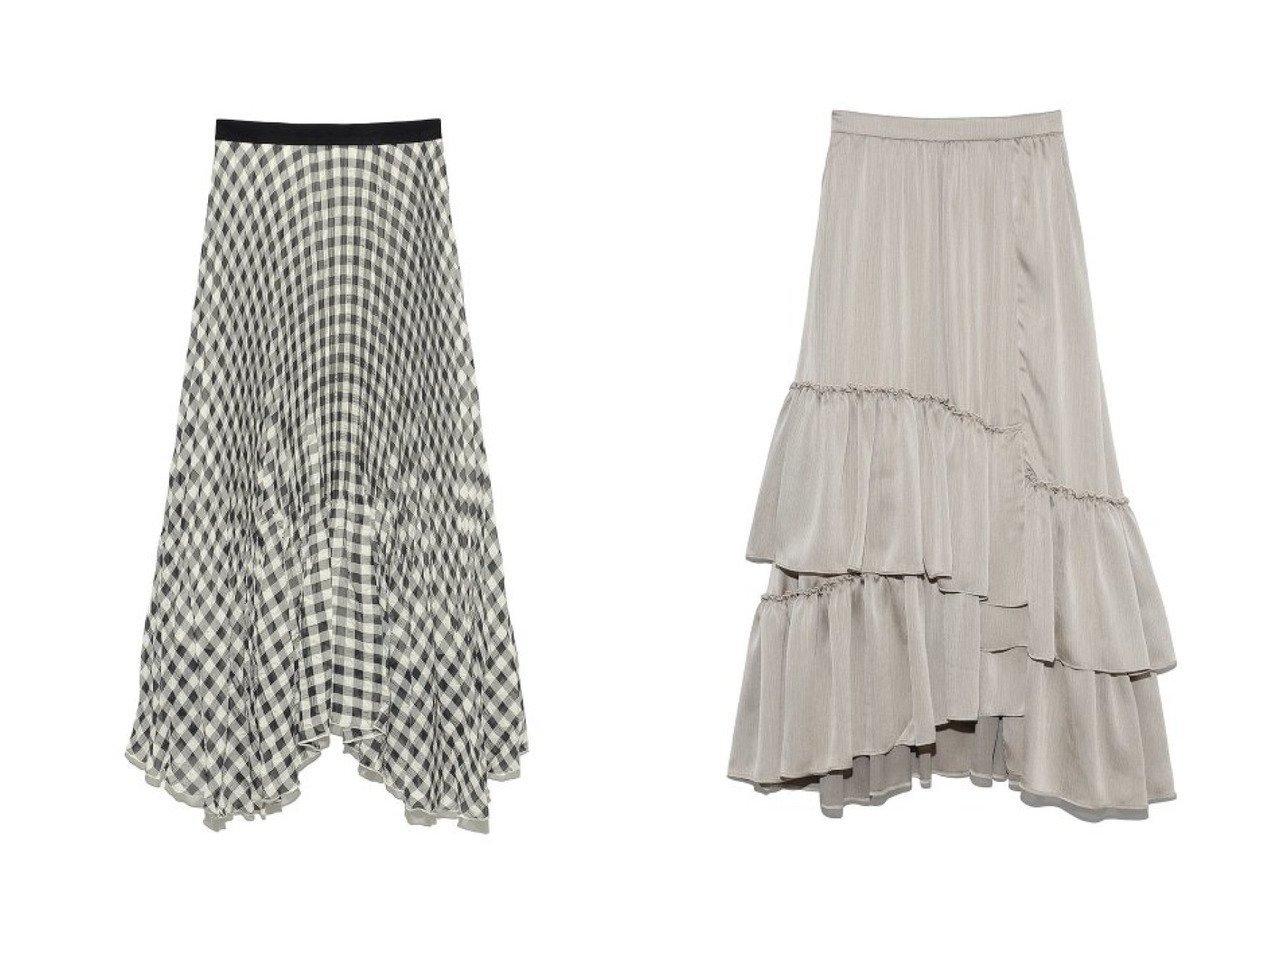 【Lily Brown/リリーブラウン】のギンガムチェックプリーツスカート&ランダムティアードスカート リリーブラウンのおすすめ!人気、トレンド・レディースファッションの通販 おすすめで人気の流行・トレンド、ファッションの通販商品 メンズファッション・キッズファッション・インテリア・家具・レディースファッション・服の通販 founy(ファニー) https://founy.com/ 雑誌掲載アイテム Magazine items ファッション雑誌 Fashion magazines アール ar ファッション Fashion レディースファッション WOMEN スカート Skirt プリーツスカート Pleated Skirts ロングスカート Long Skirt ティアードスカート Tiered Skirts S/S 春夏 SS Spring/Summer ギンガム サテン シアー チェック フェミニン プリーツ ラベンダー ロング 春 Spring NEW・新作・新着・新入荷 New Arrivals 2月号 カットソー ティアードスカート バランス フリル プレーン ランダム 雑誌 |ID:crp329100000022024